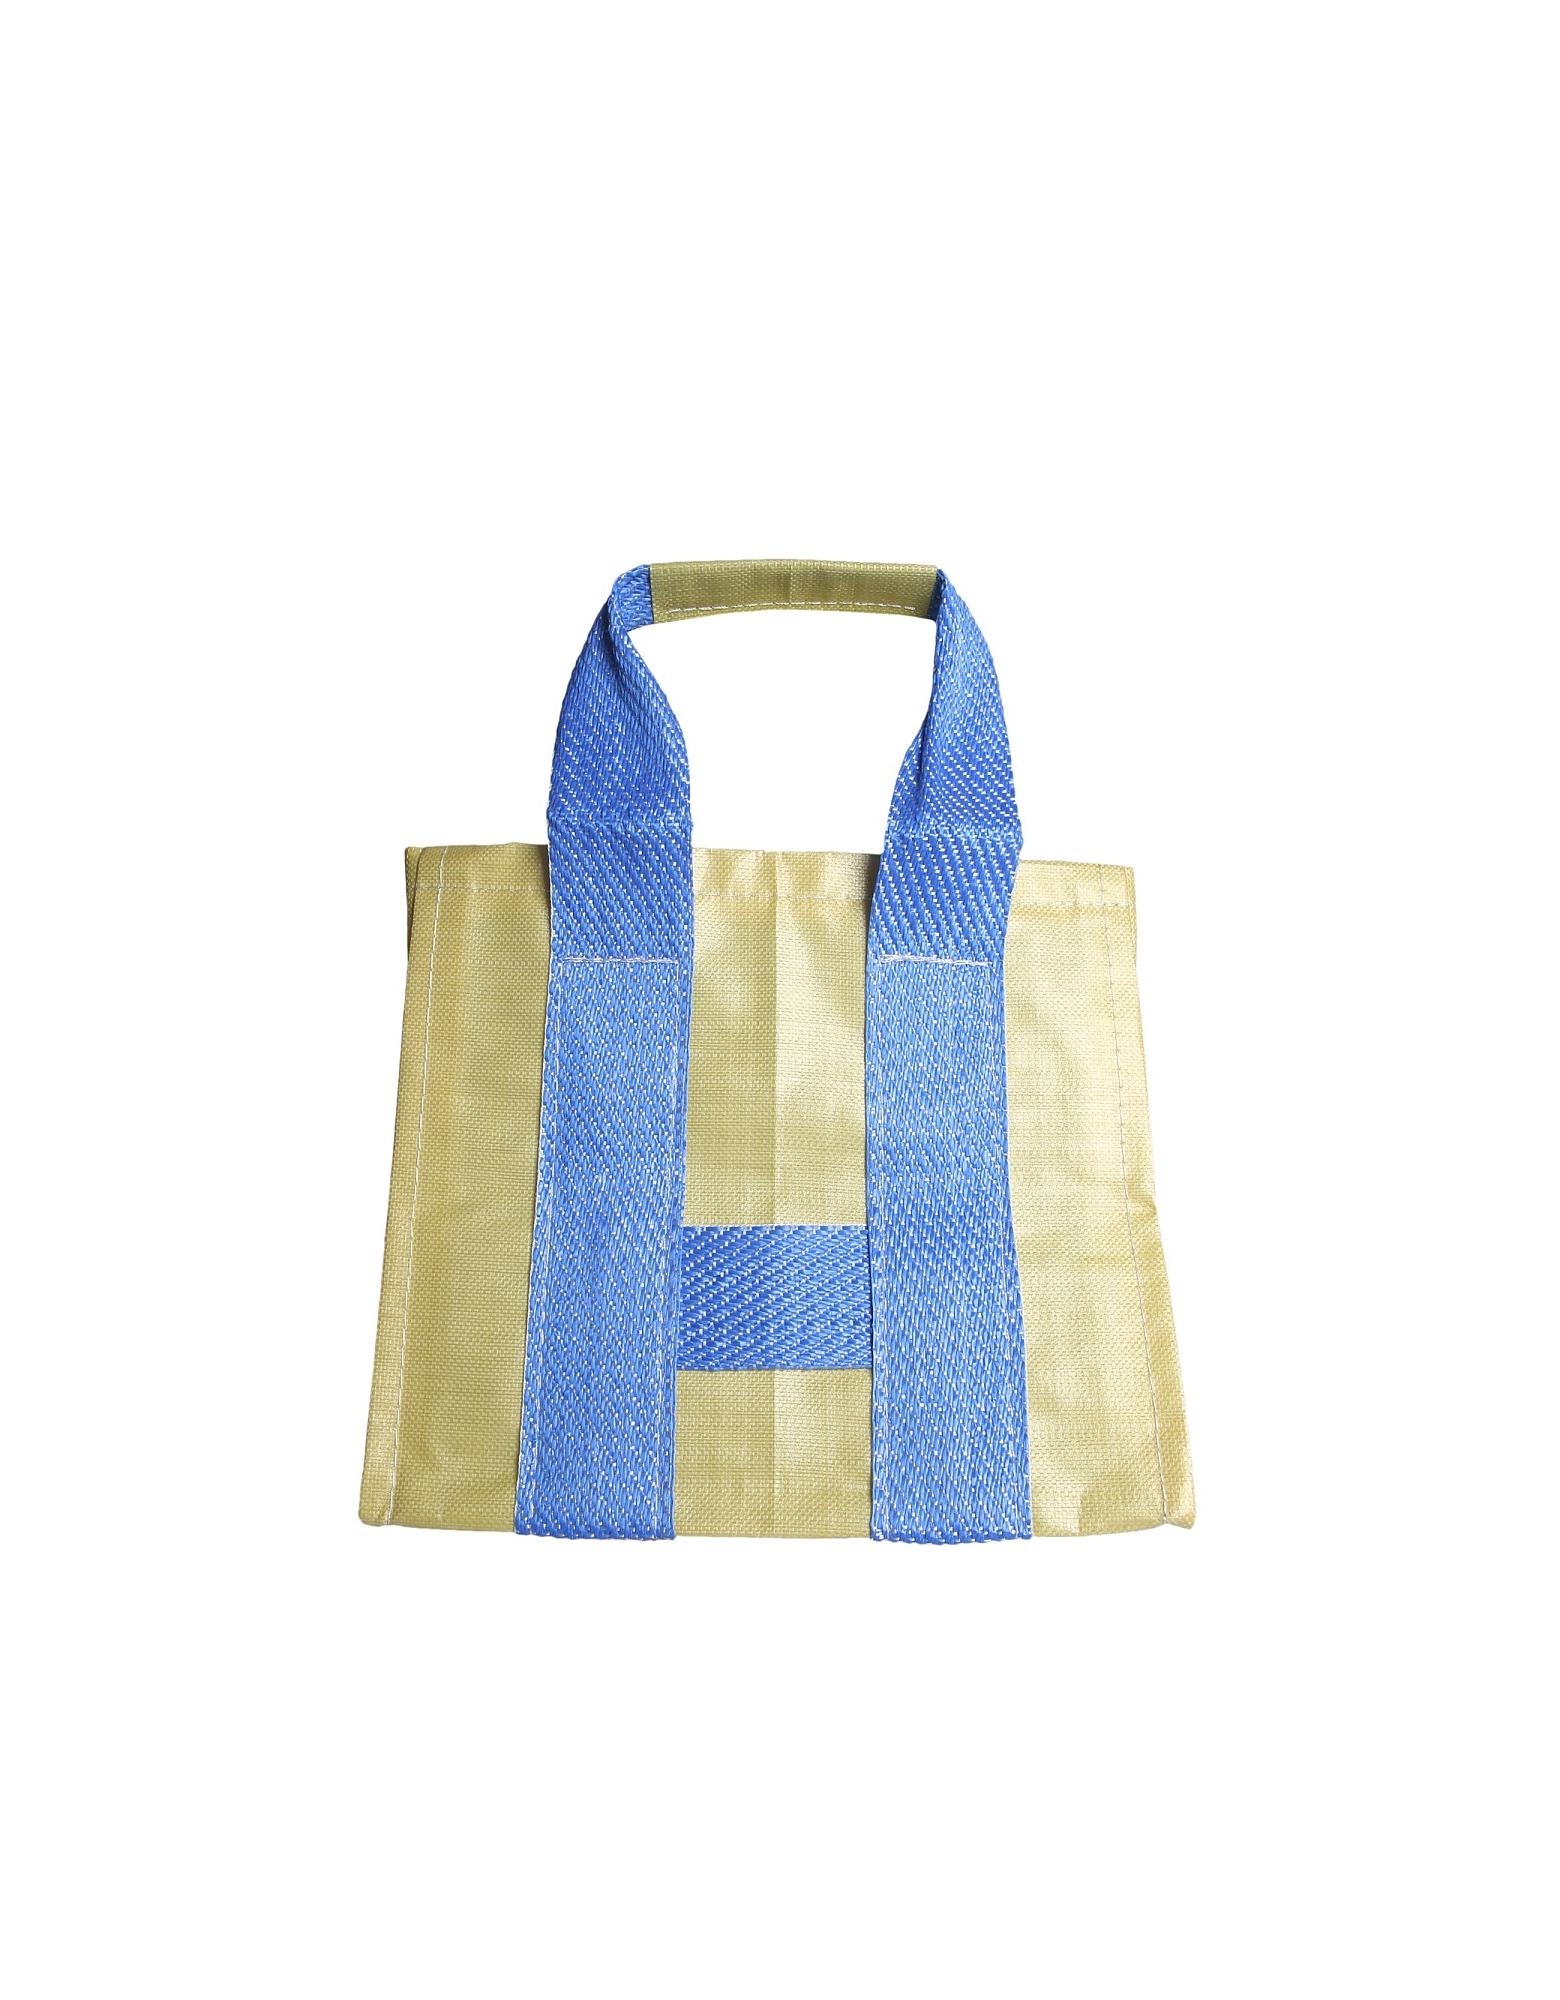 Comme des Garçons Designer Men's Bags, Techno Fabric Shopping Bag